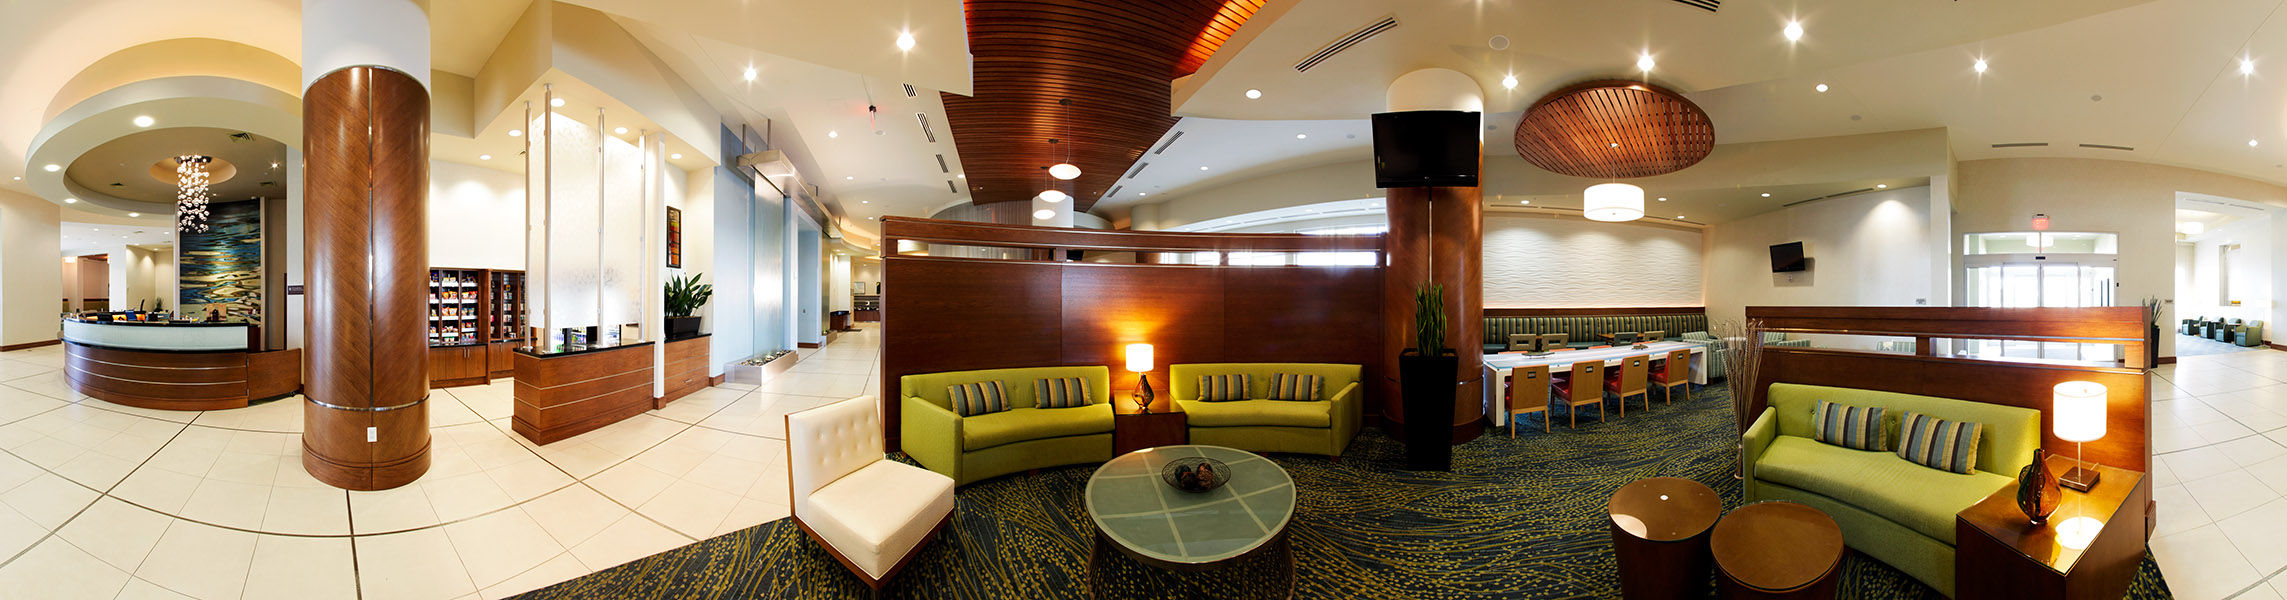 SpringHill Suites by Marriott Las Vegas Convention Center image 3